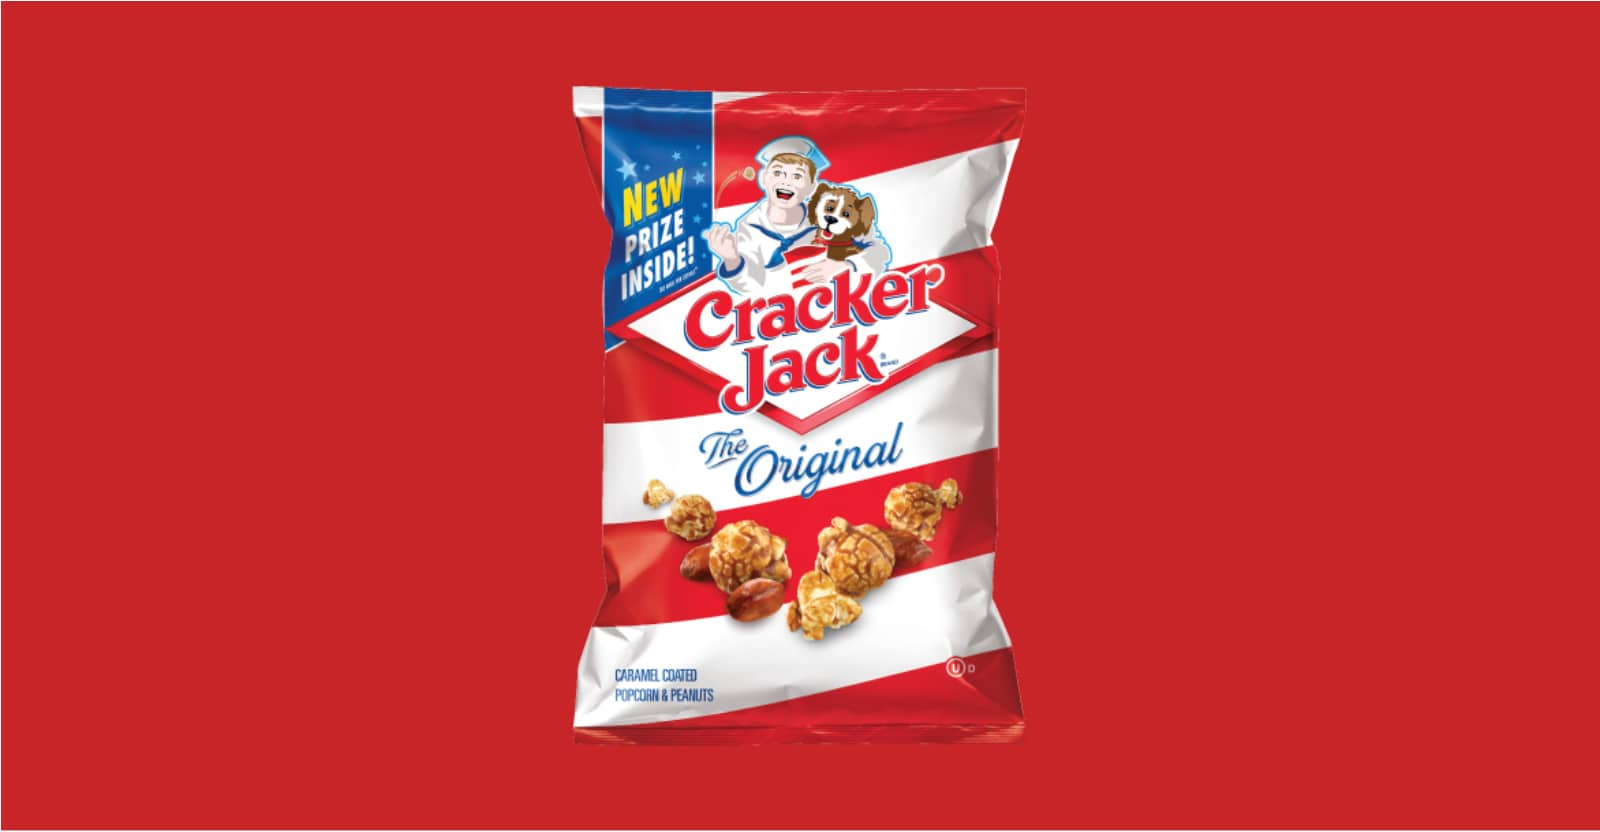 are cracker jacks gluten-free